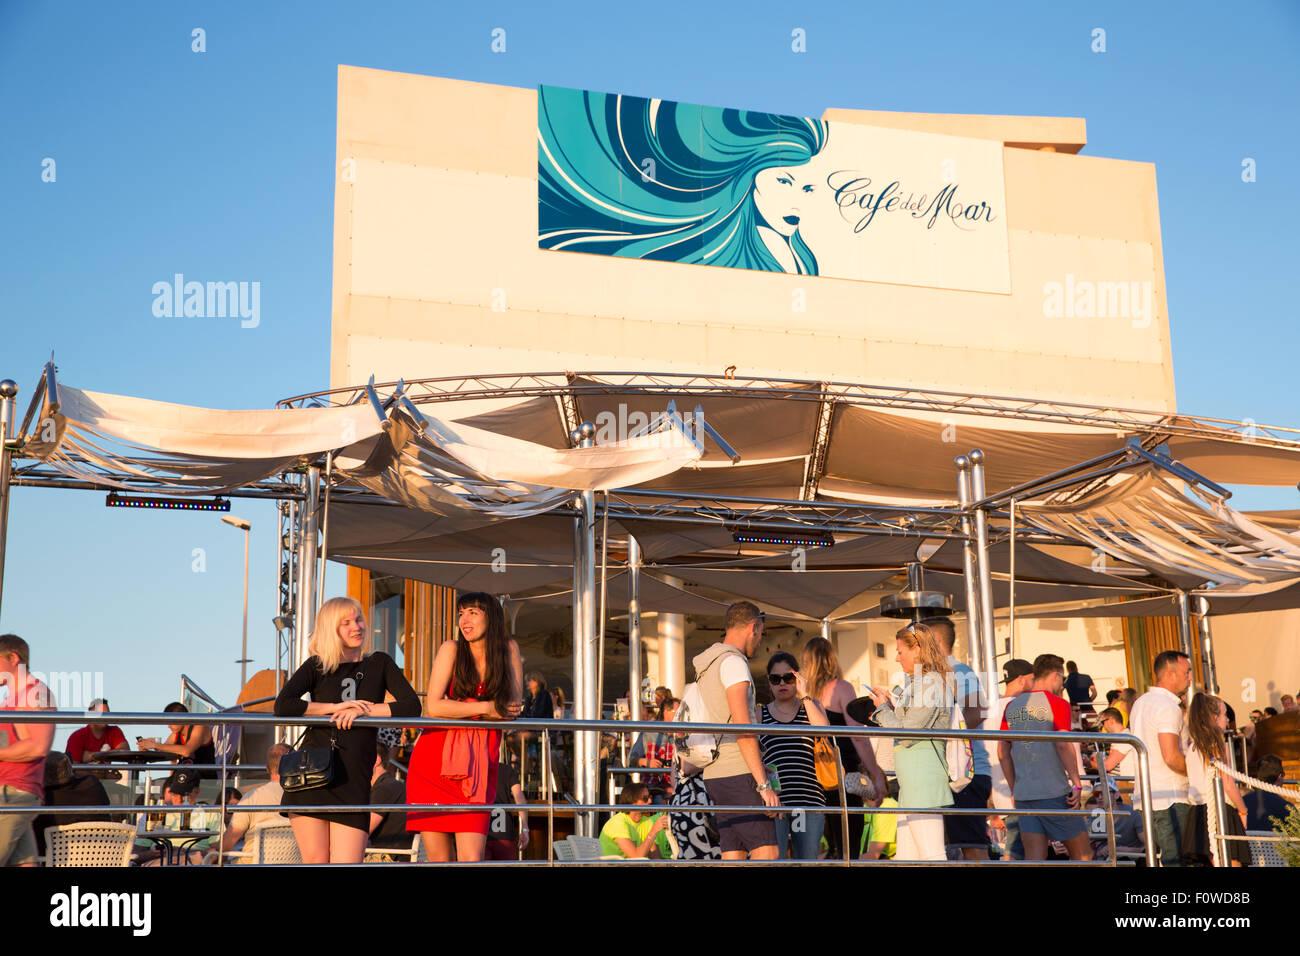 Cafe Del Mar in Ibiza - Stock Image